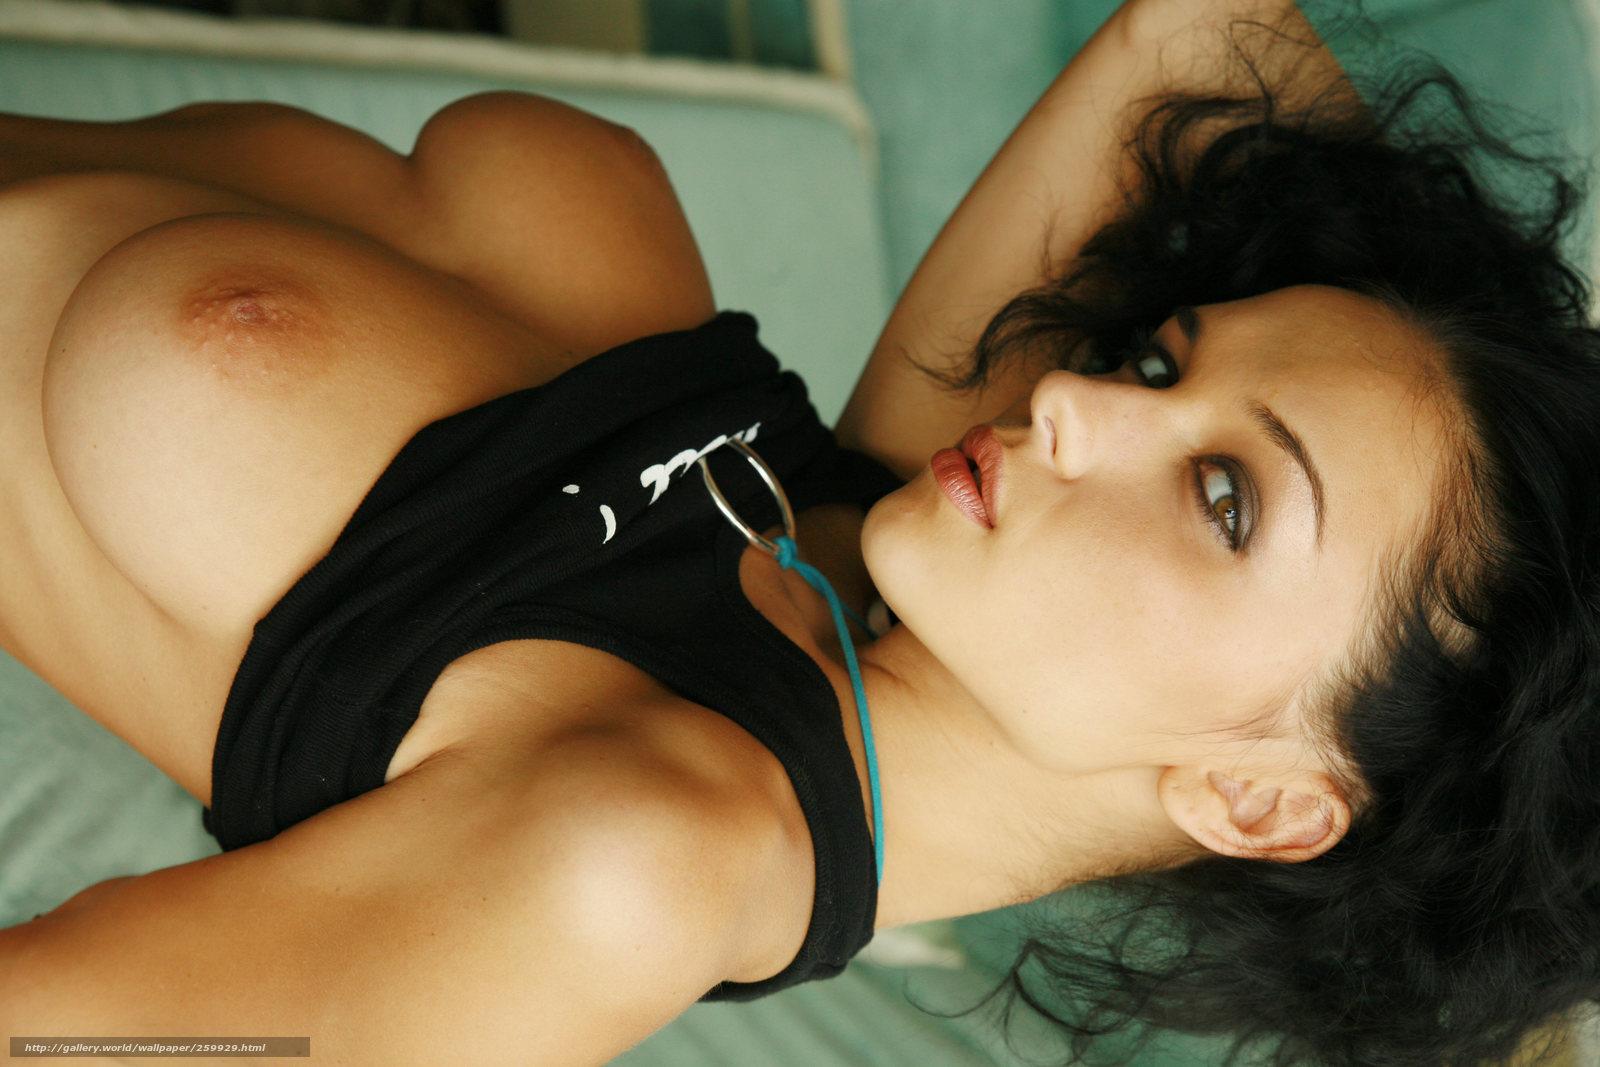 Супер эротика и брюнетки 22 фотография